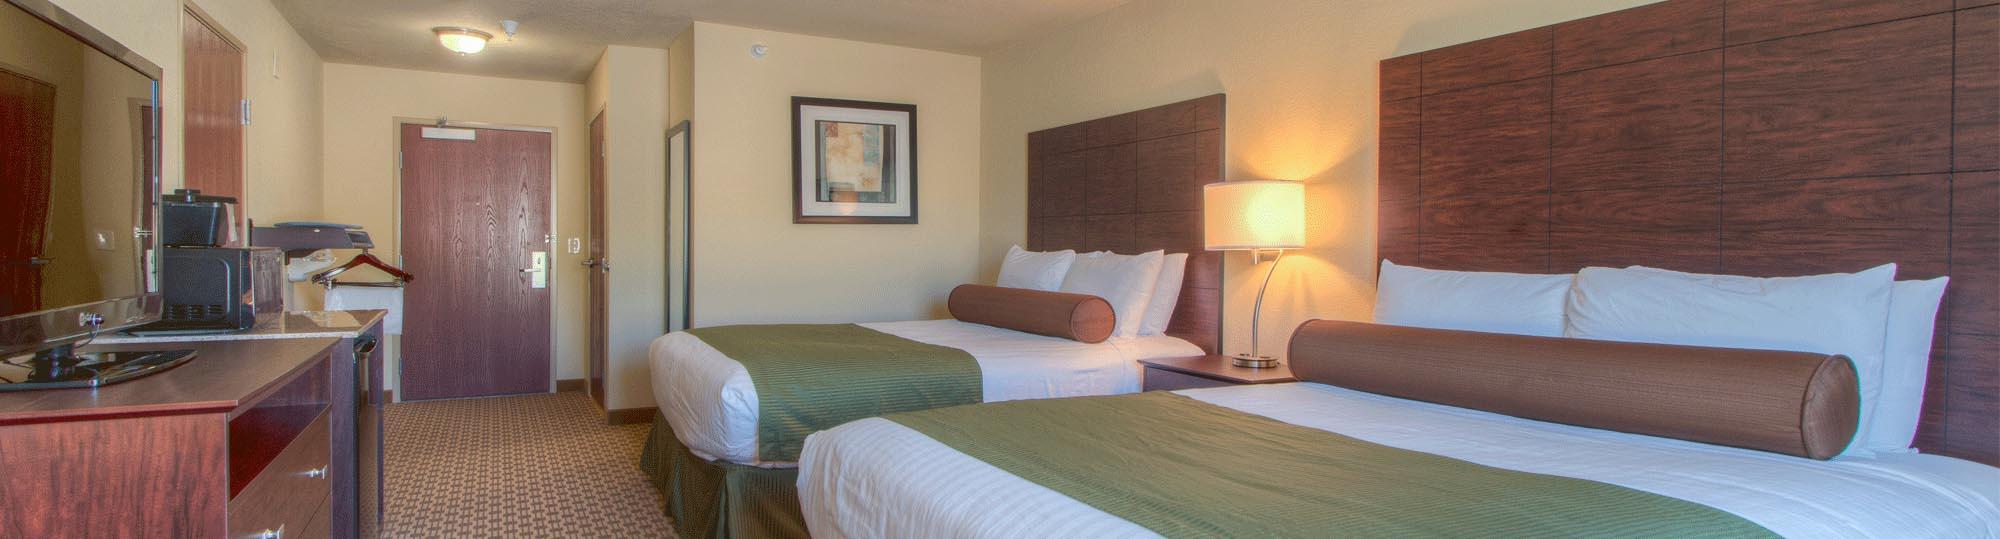 Cobblestone Inn and Suites Altamont